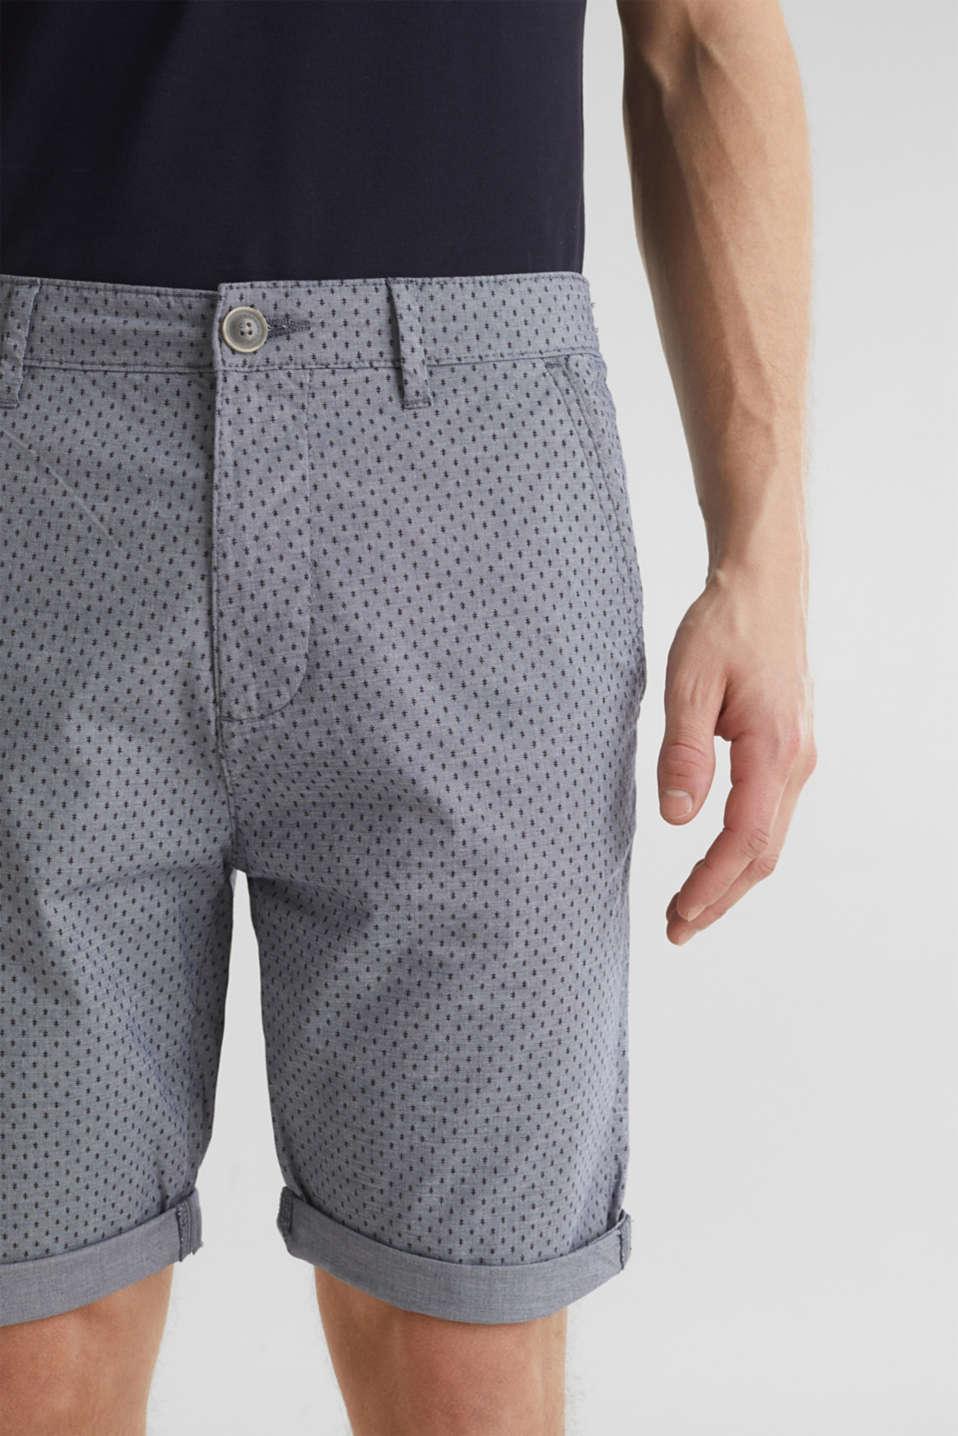 Printed stretch cotton shorts, DARK BLUE 5, detail image number 2